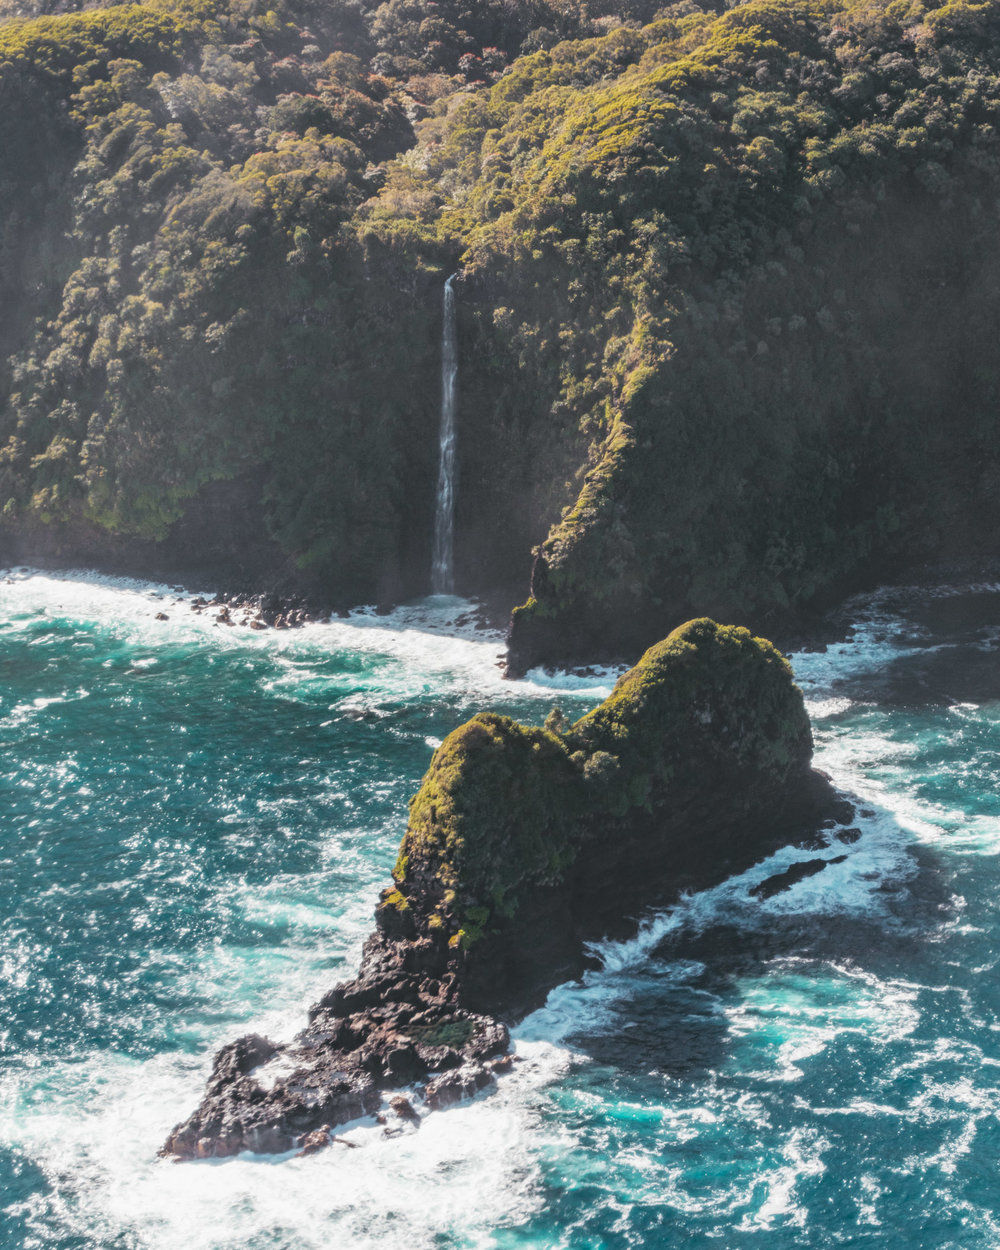 Maverick Helicopters Maui flight // The Quick Guide to Visiting Maui, Hawaii #readysetjetset #hawaii #maui